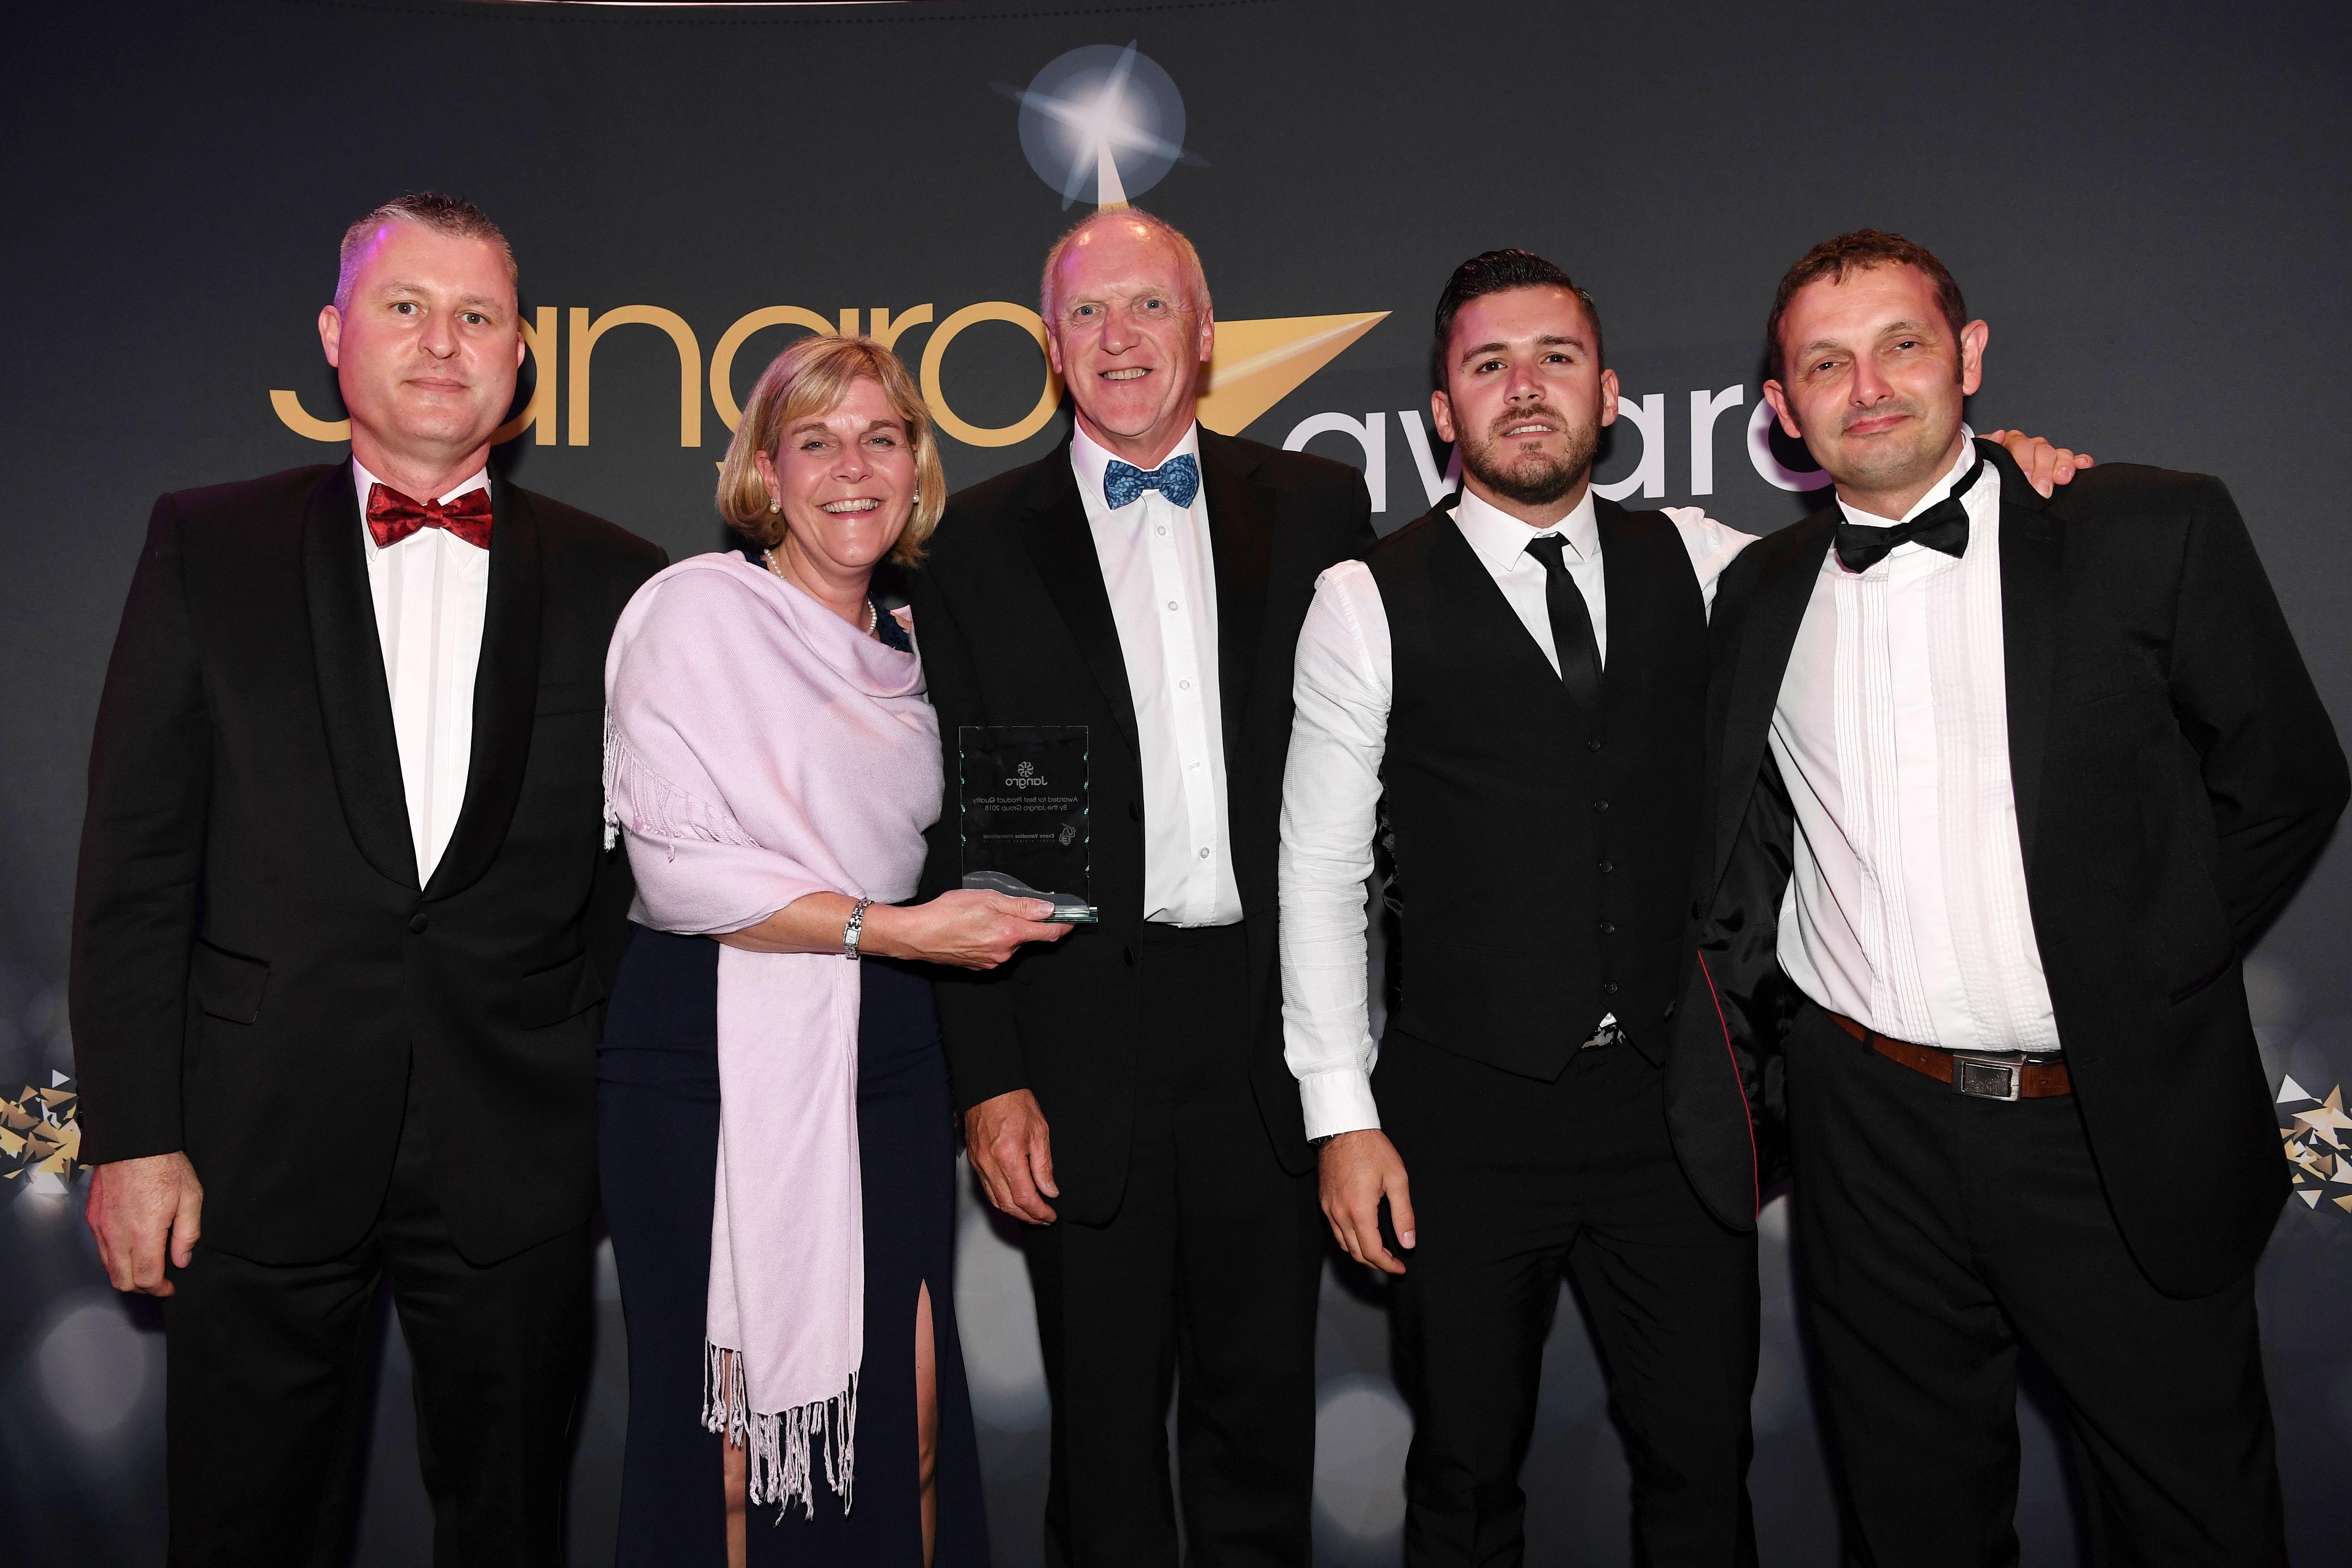 Jangro Supplier Awards